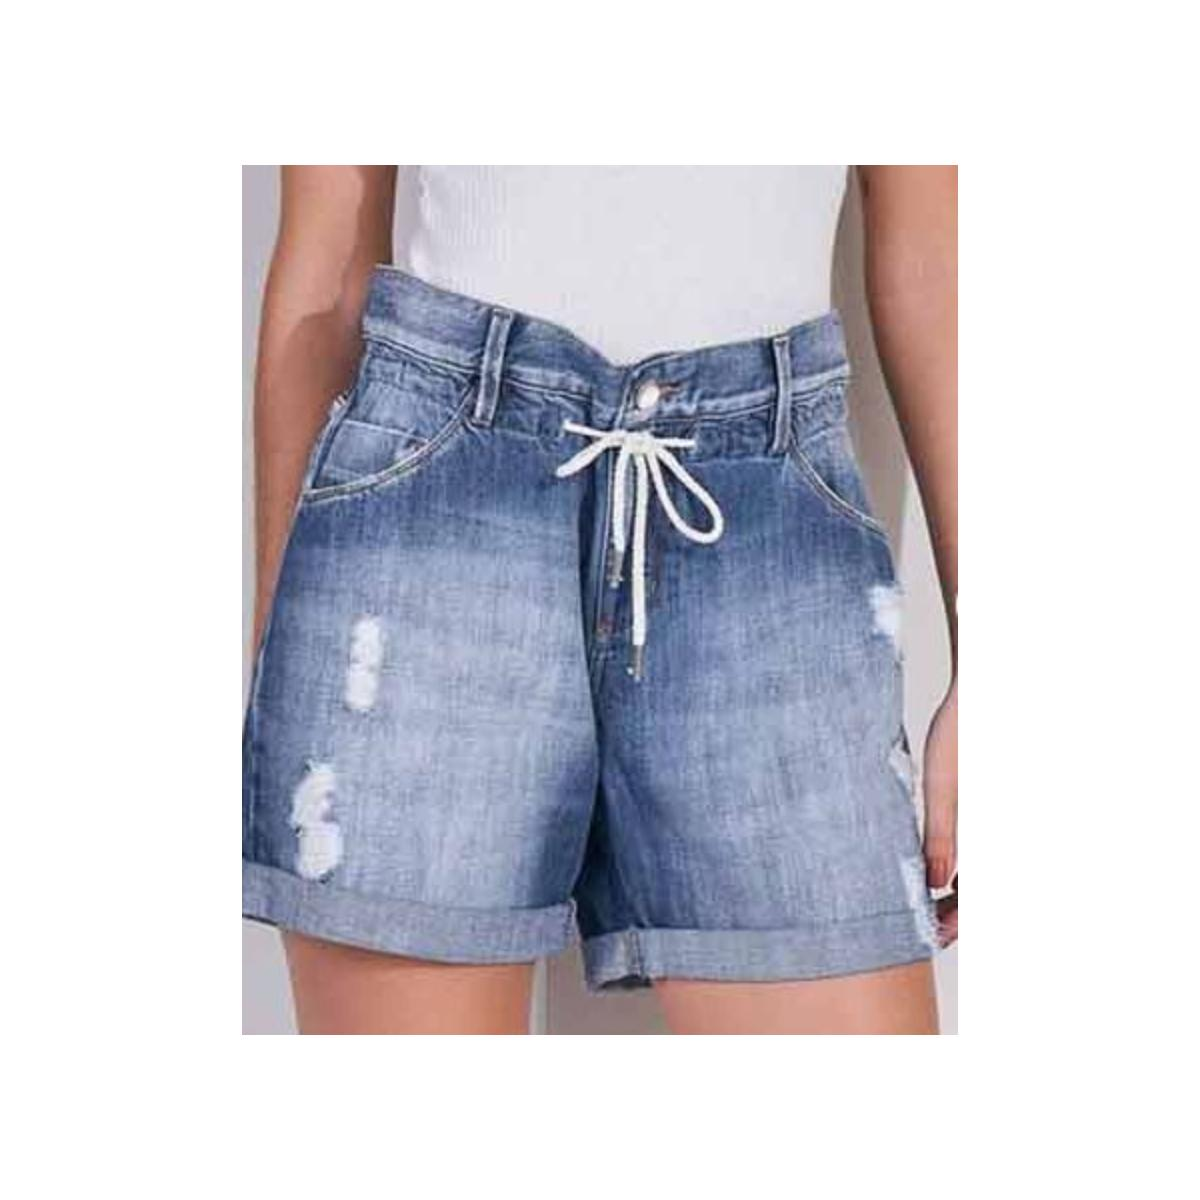 Short Feminino Lado Avesso L113185 Jeans